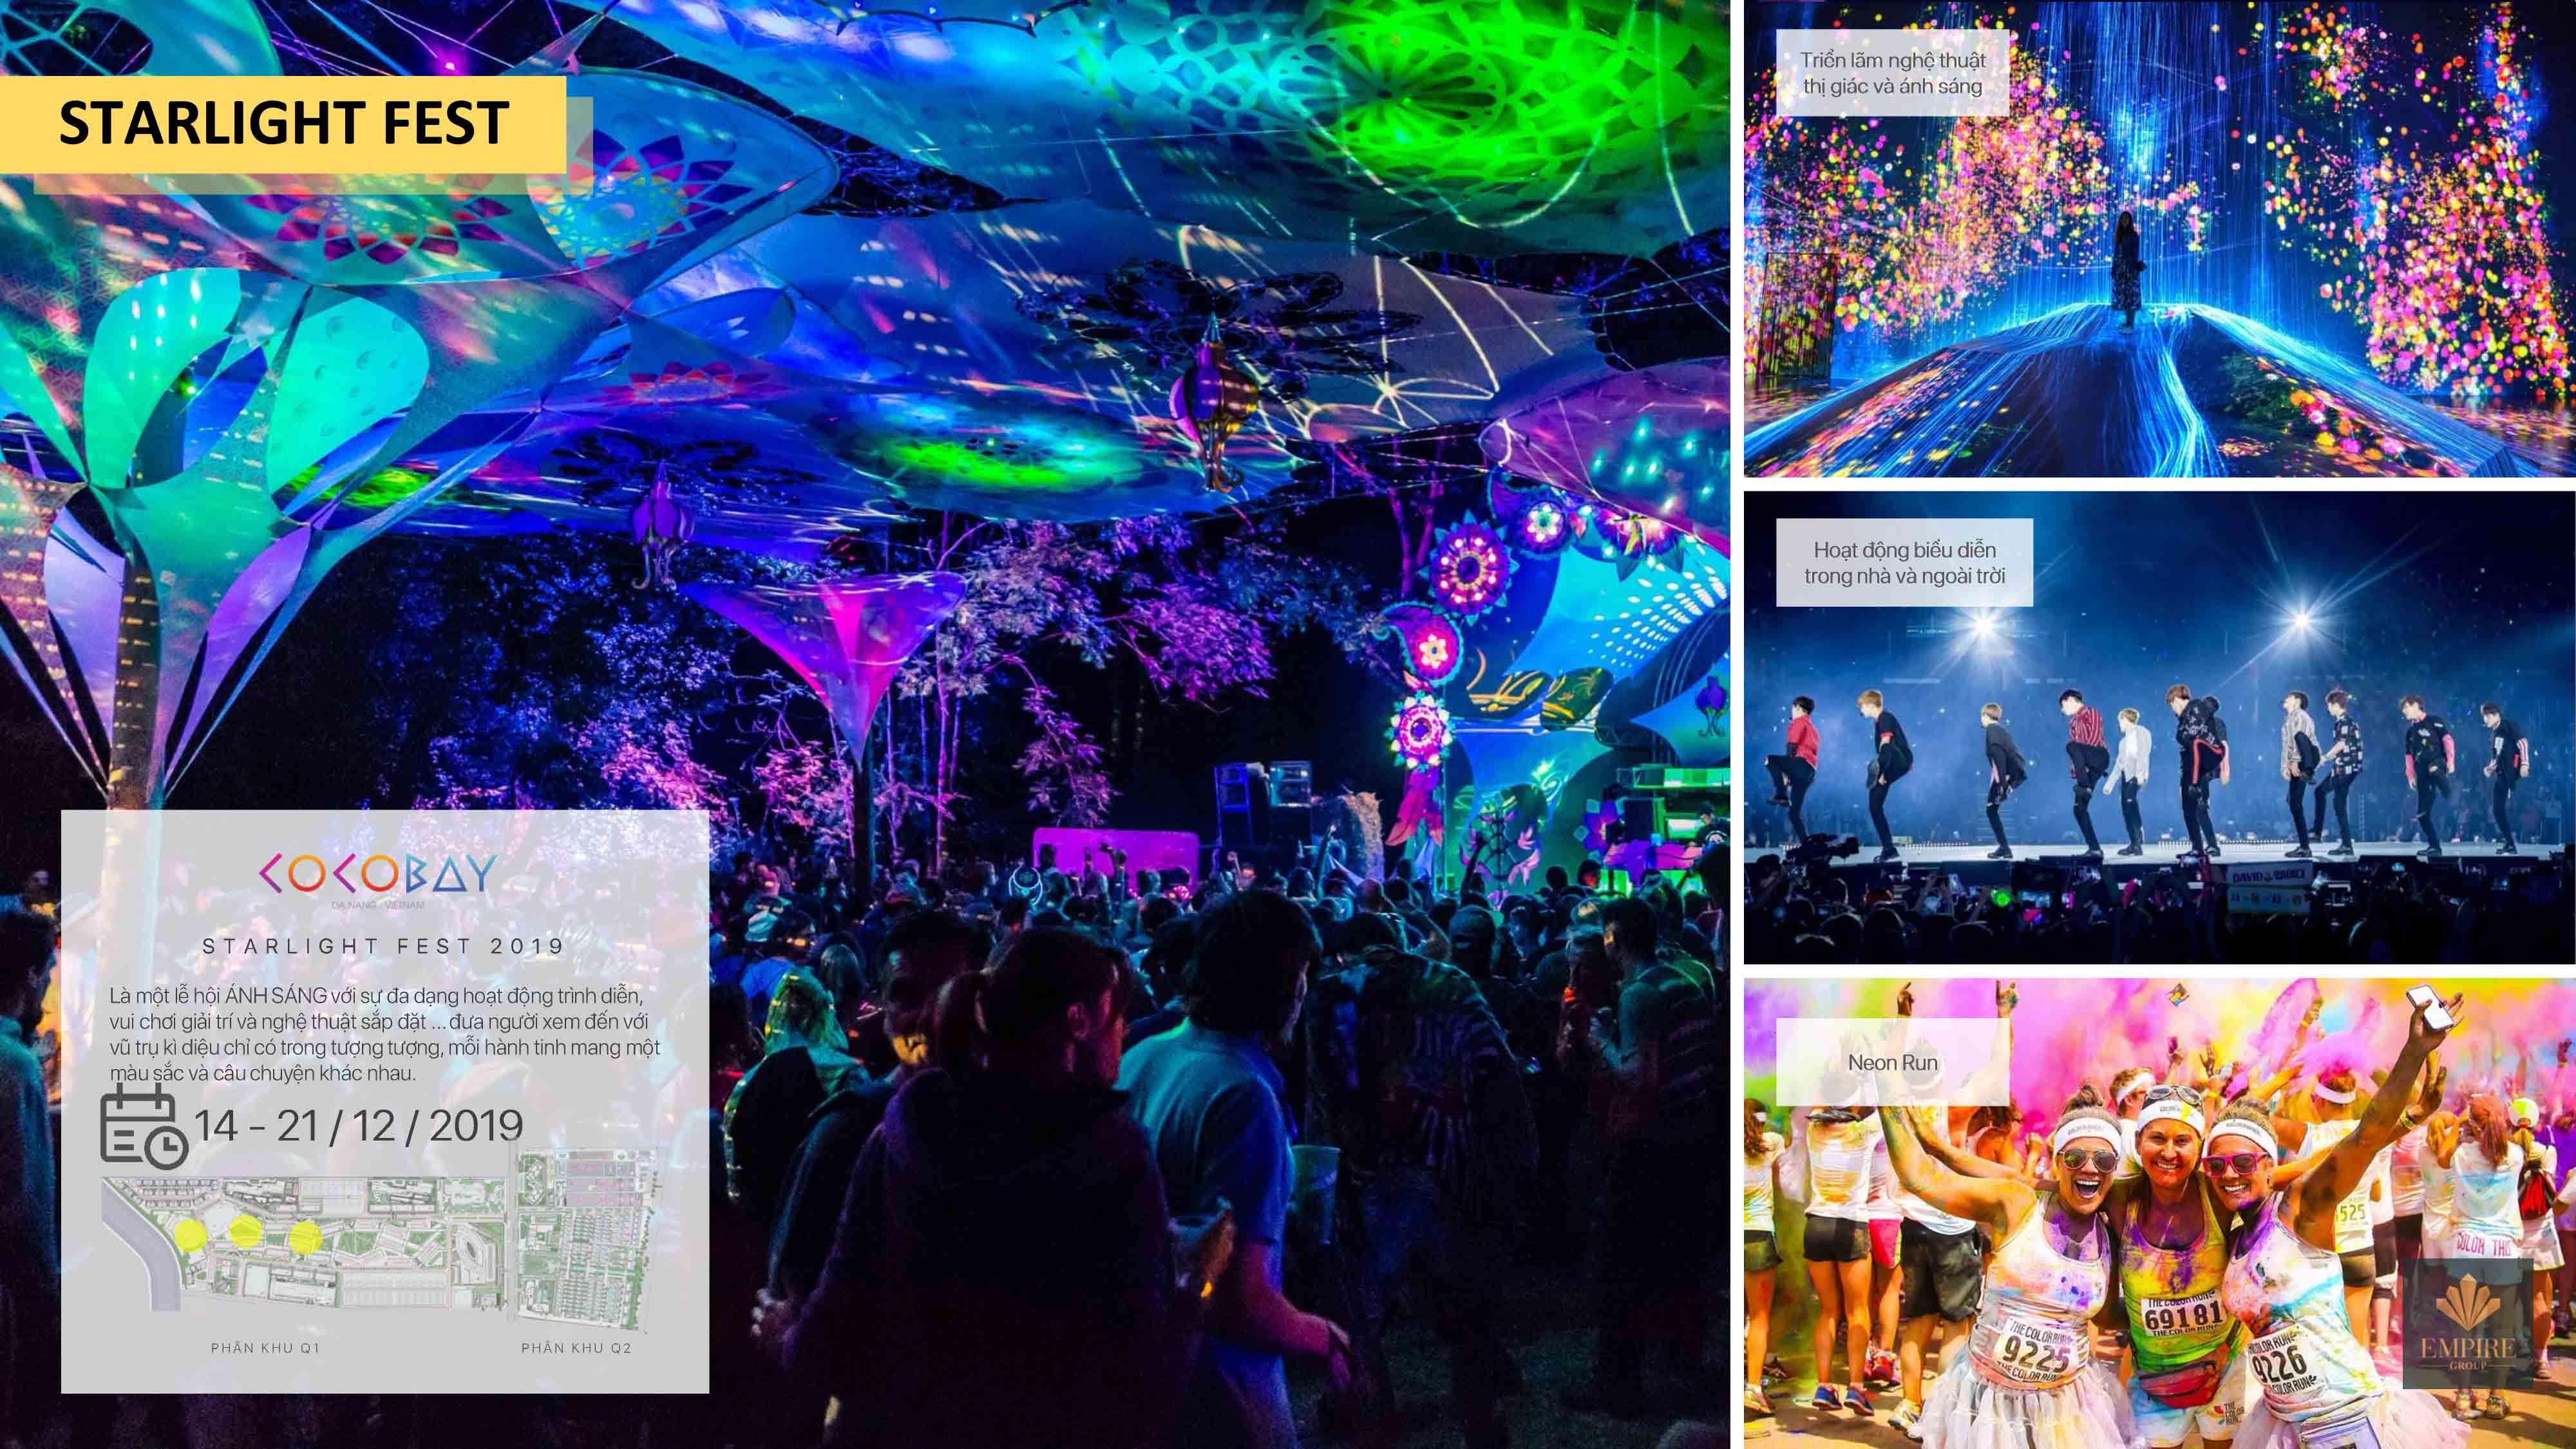 Lễ hội sắc màu tại Starlight Fest